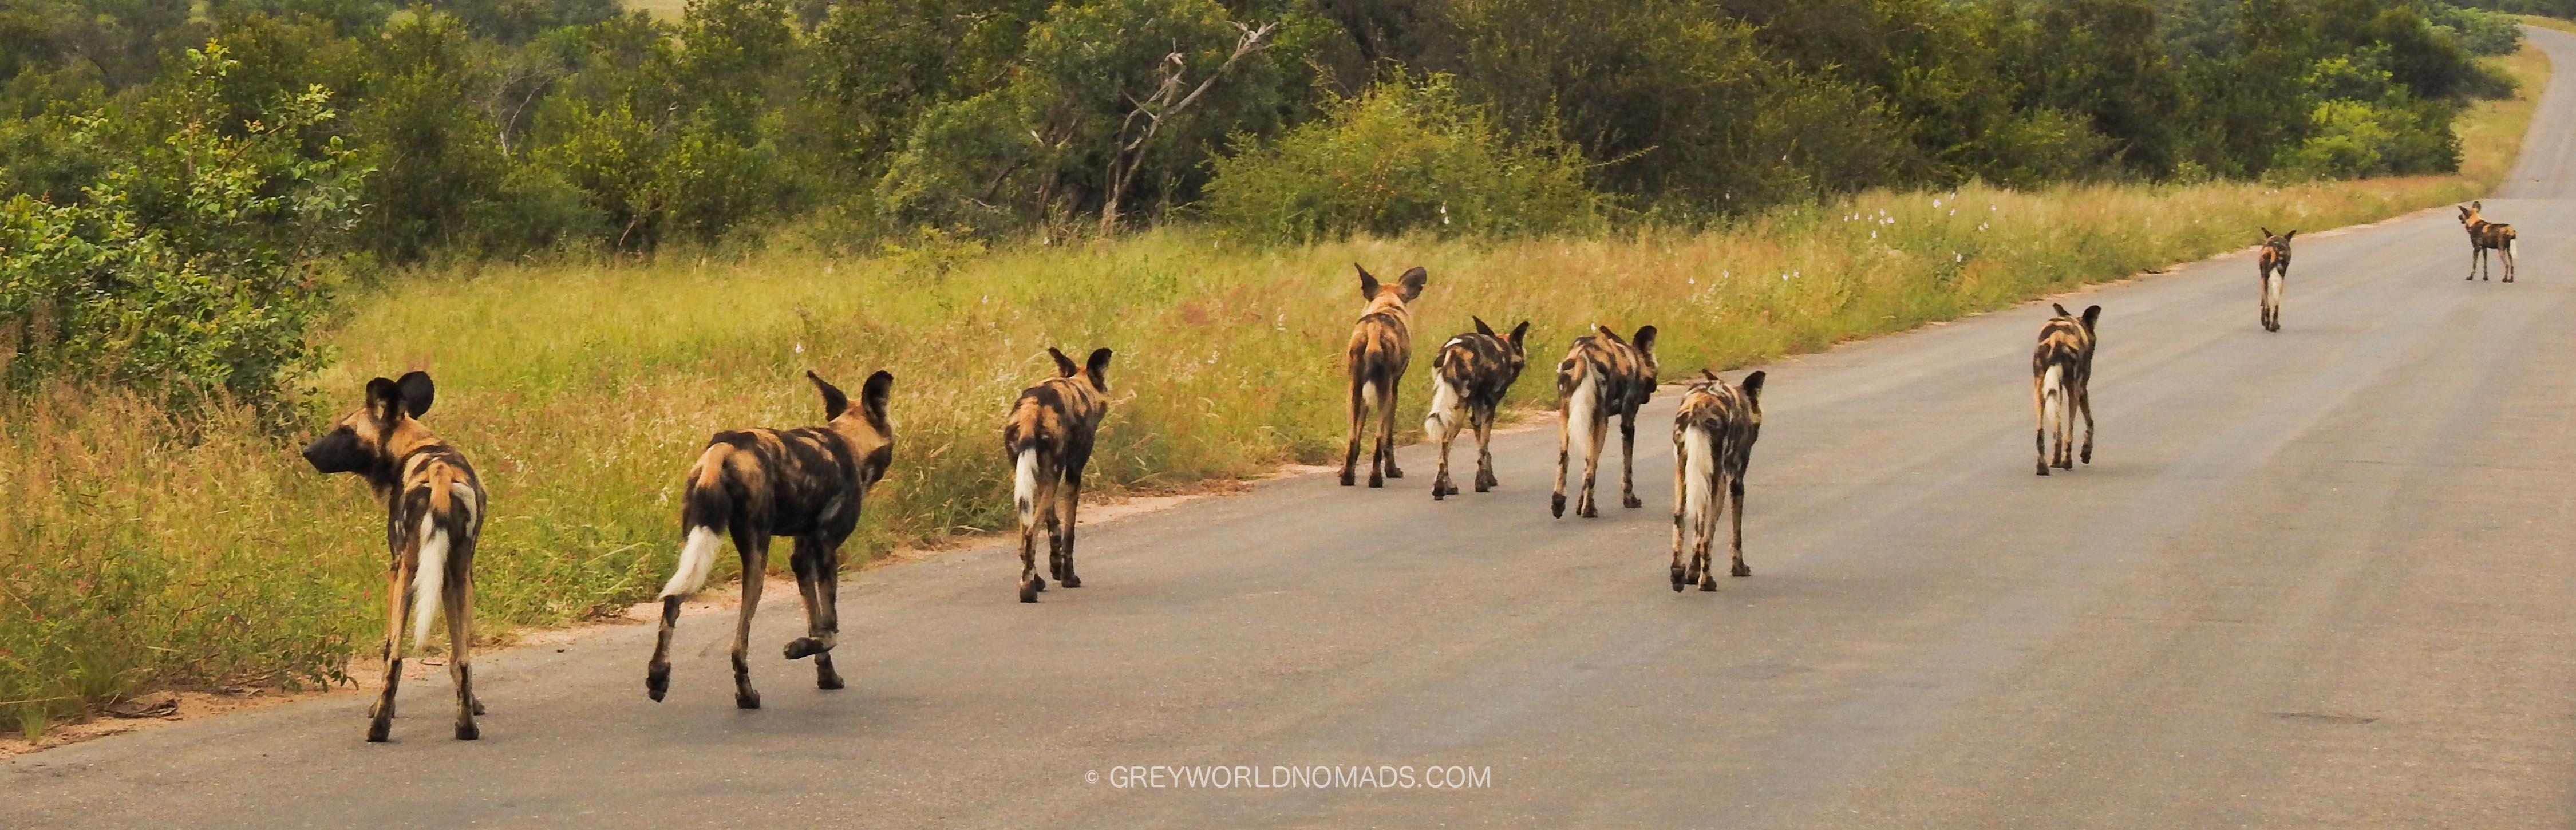 skukuza-kruger-nationalpark-southafrica-24